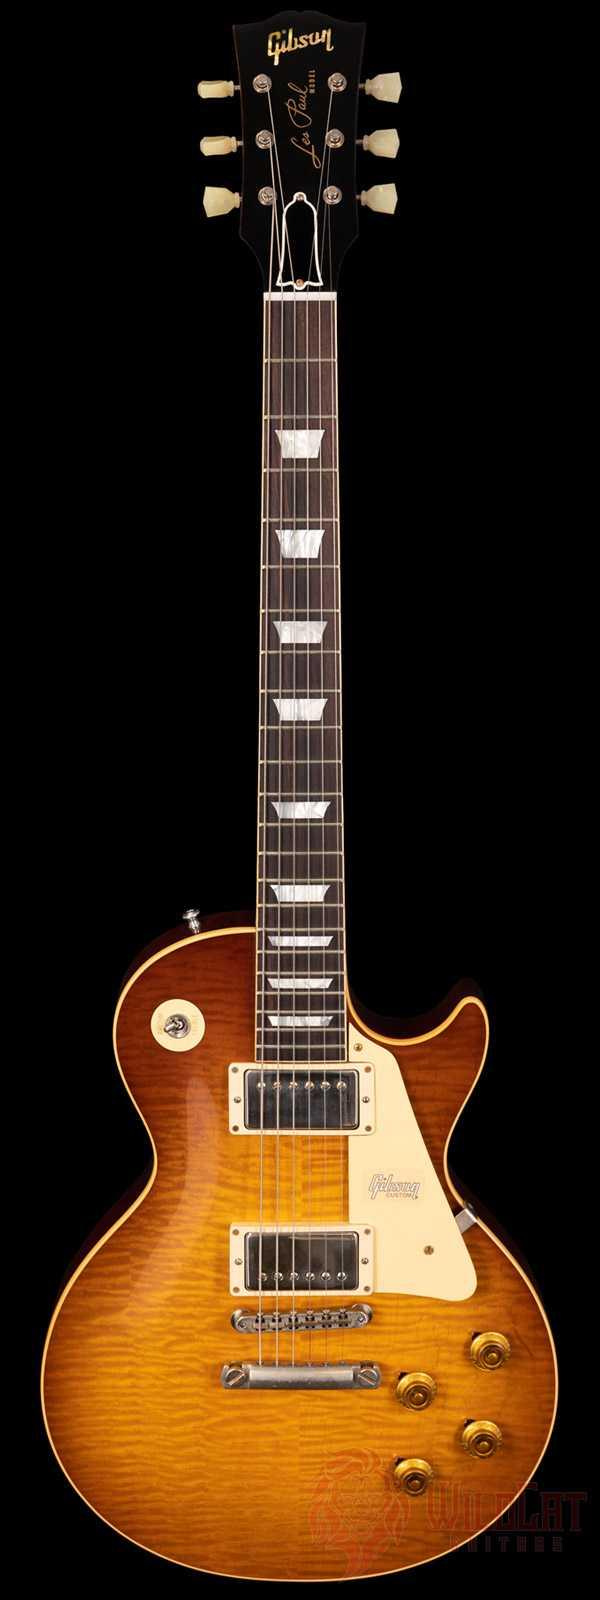 Gibson Custom Shop Tom Murphy Painted 1959 Les Paul Standard with Brazilian Fretboard VOS Weak Teaburst